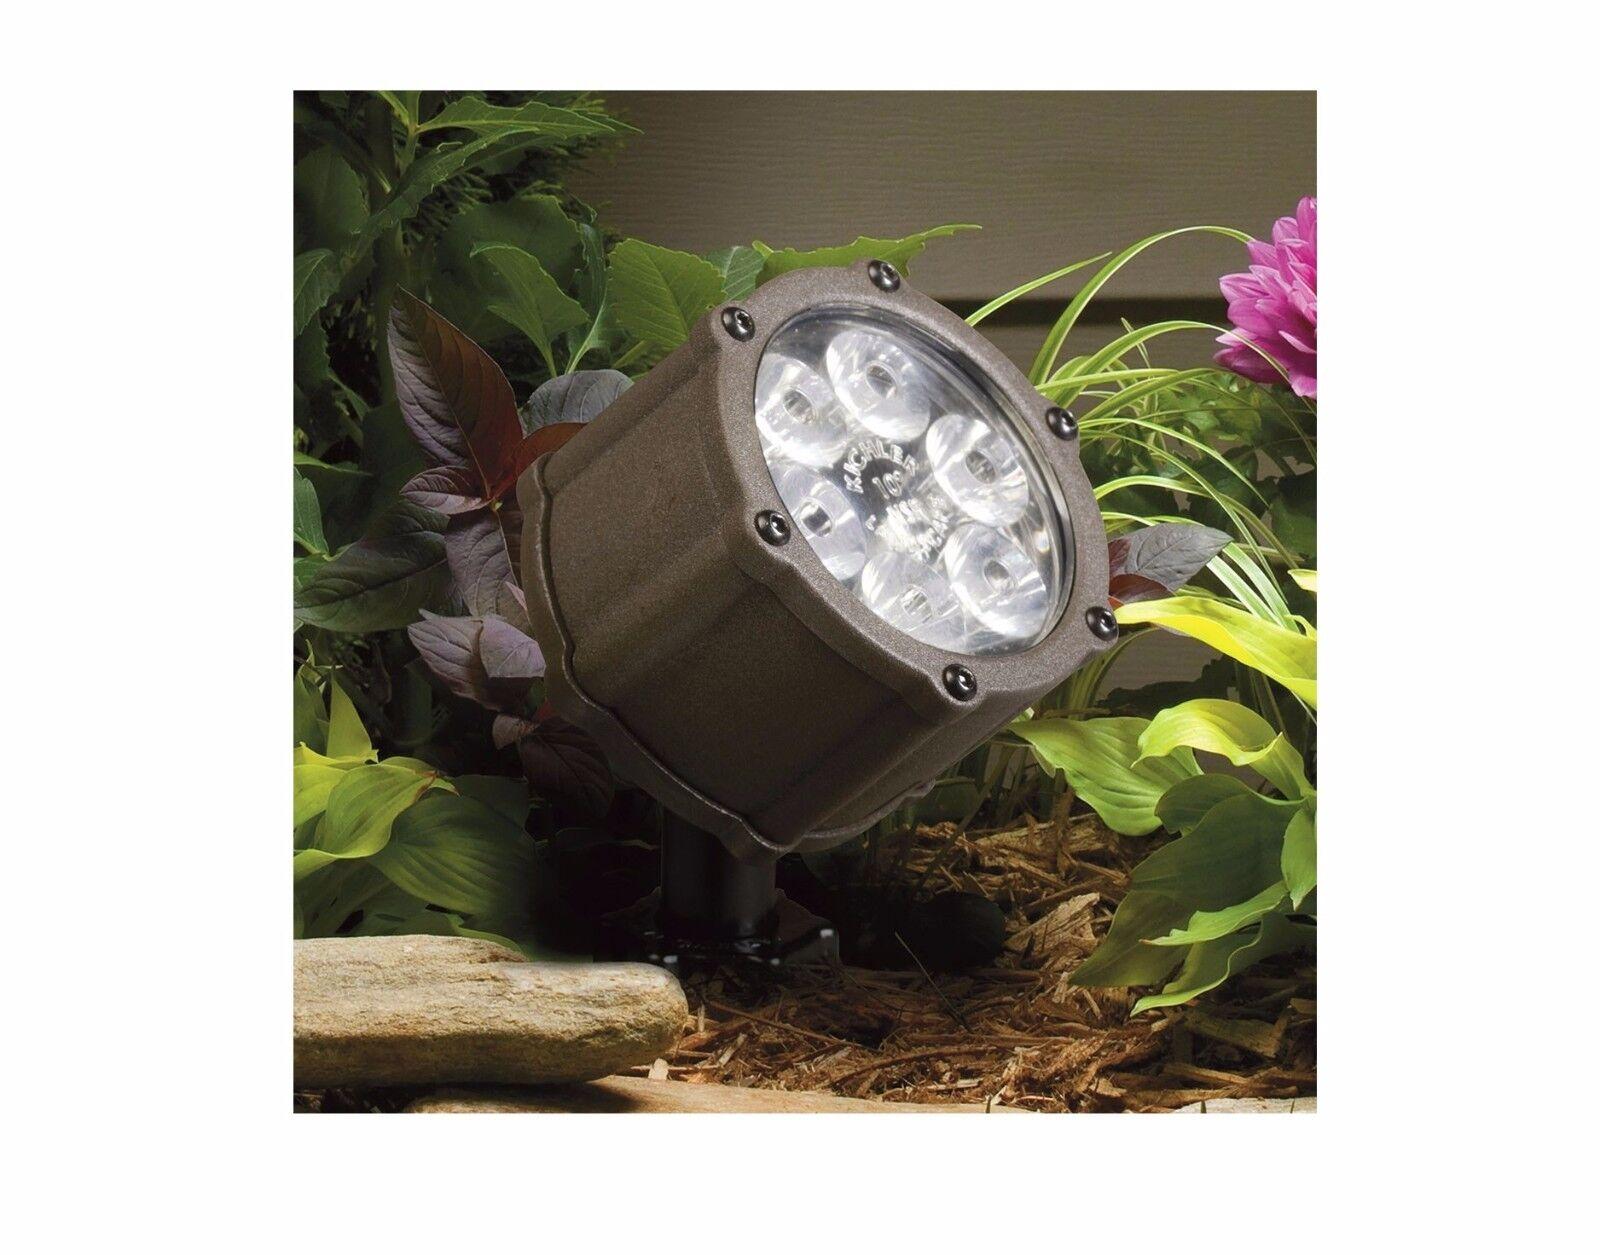 Kichler Lighting 8.5W LED luz de acento Bronce arquitectónico de textura de baja tensión